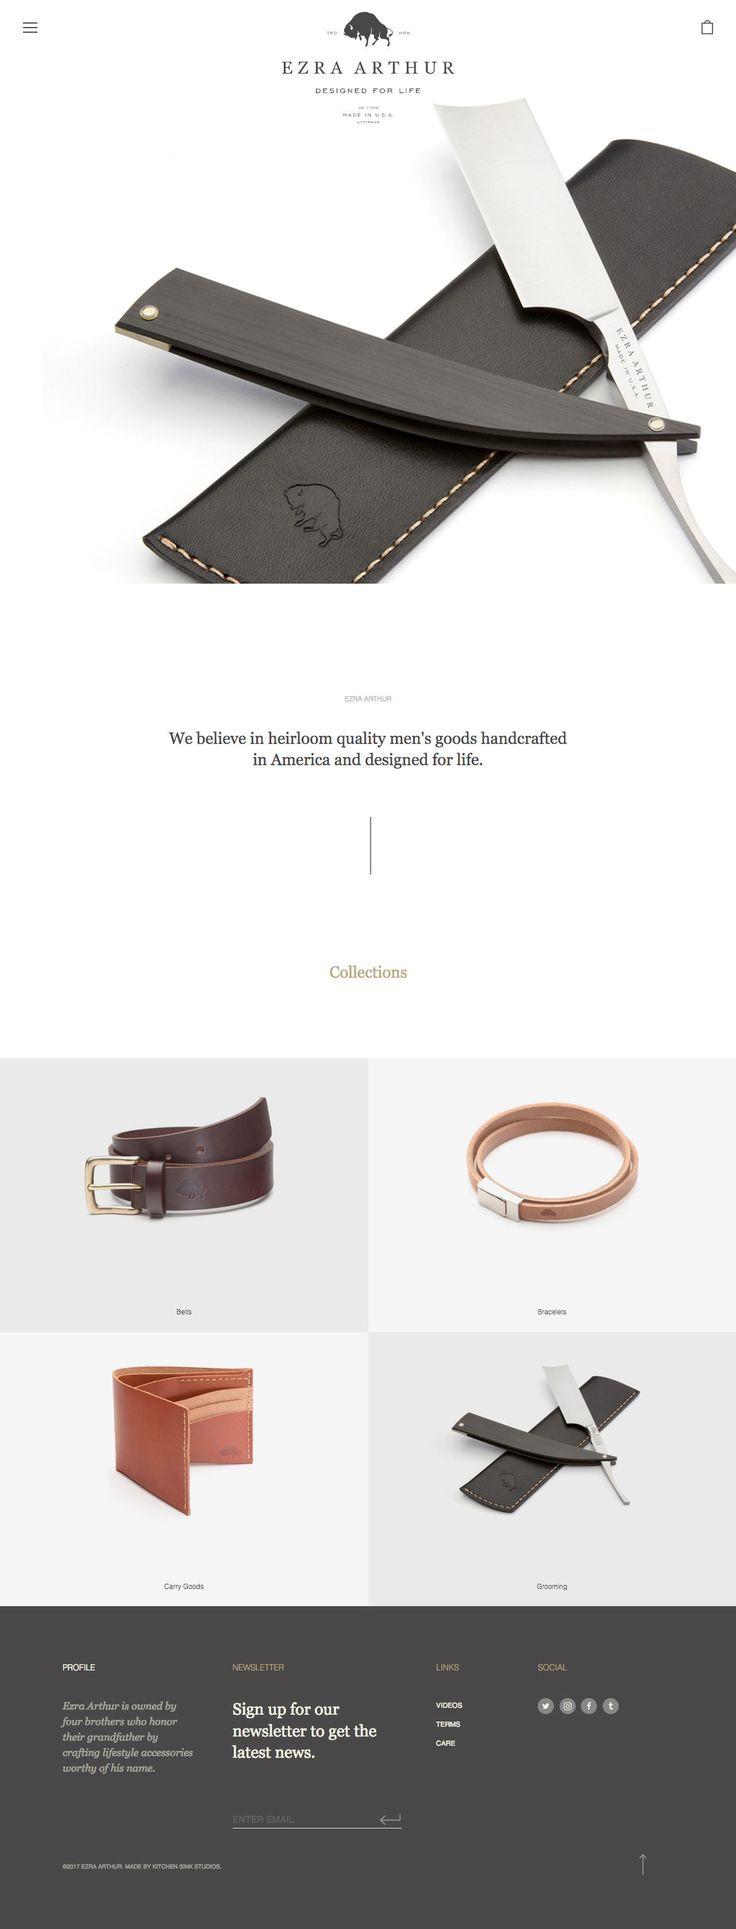 Ezra Arthur (More web design inspiration at topdesigninspiration.com) #design #web #webdesign #sitedesign #responsive #ux #ui